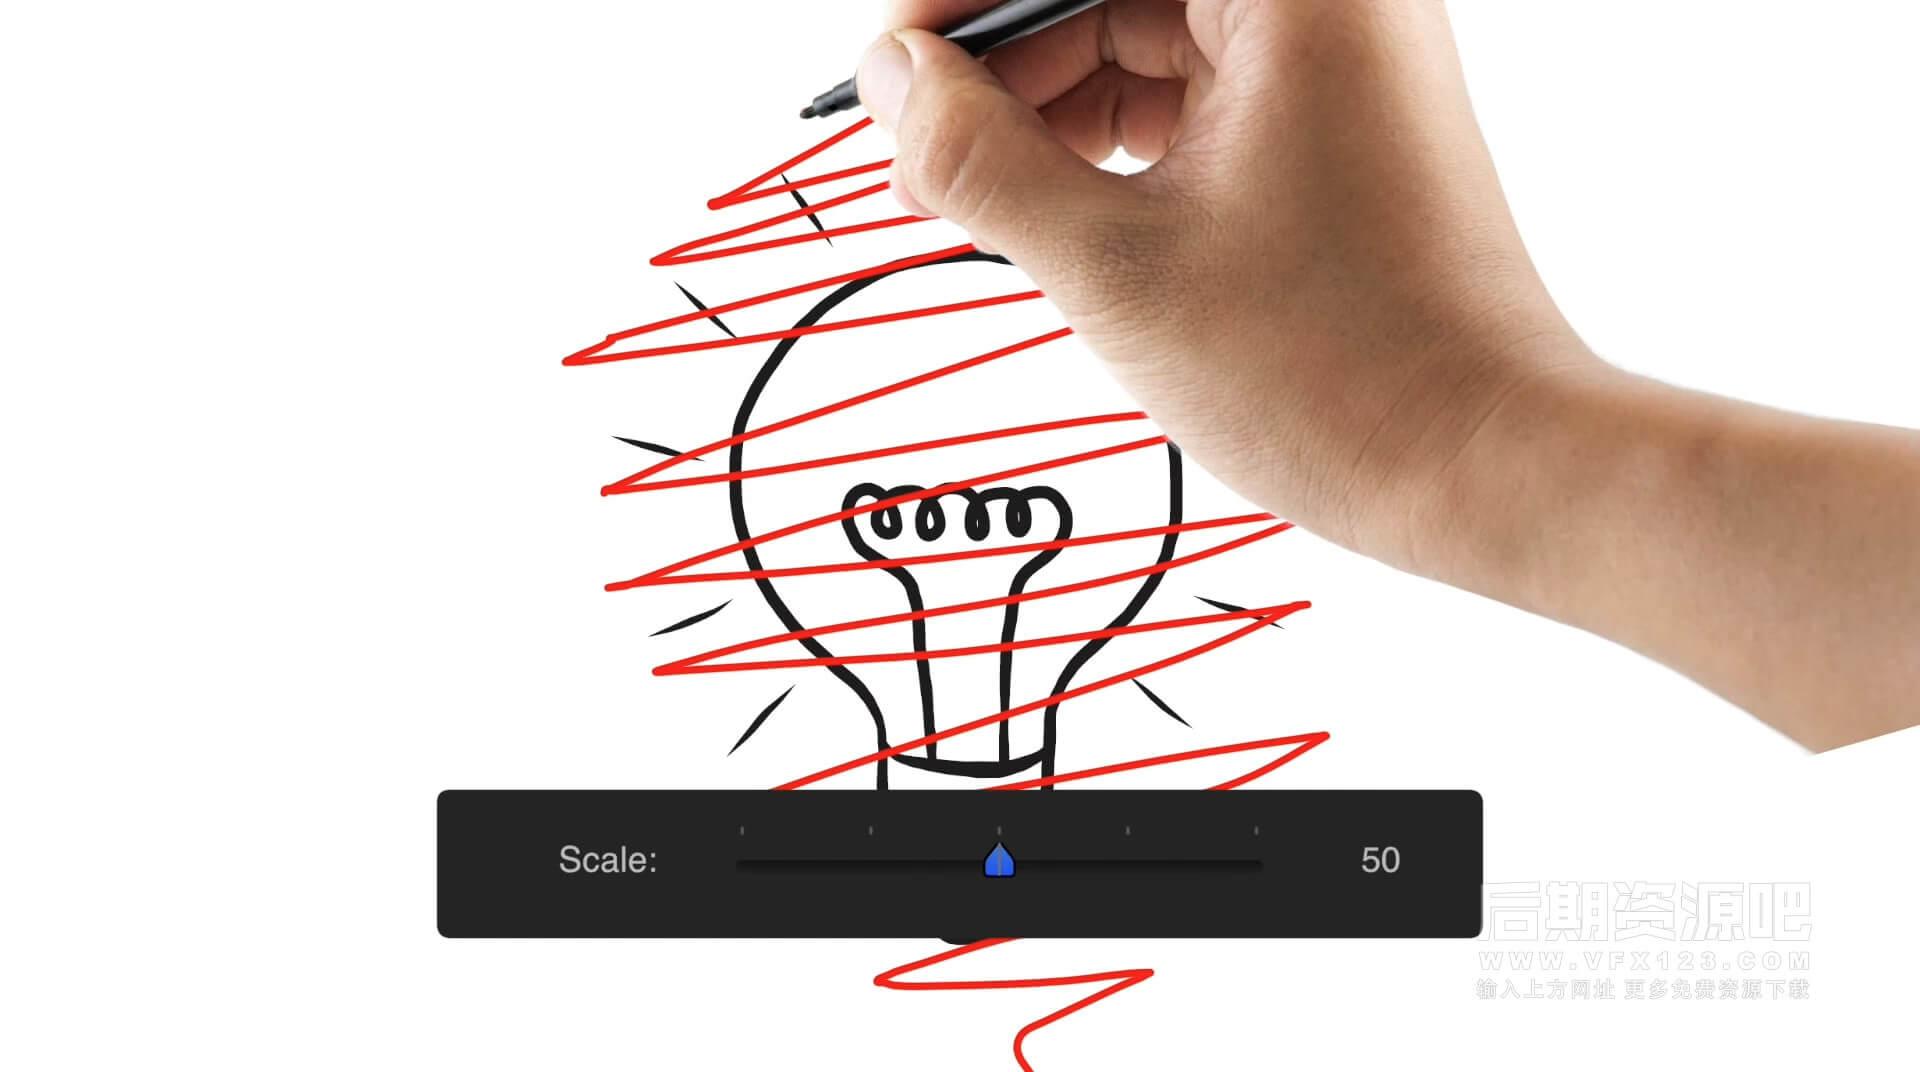 FCPX实时动画插件 文字图片视频沿手绘路径运动效果制作工具 PROKEYFRAME 支持10.4.6